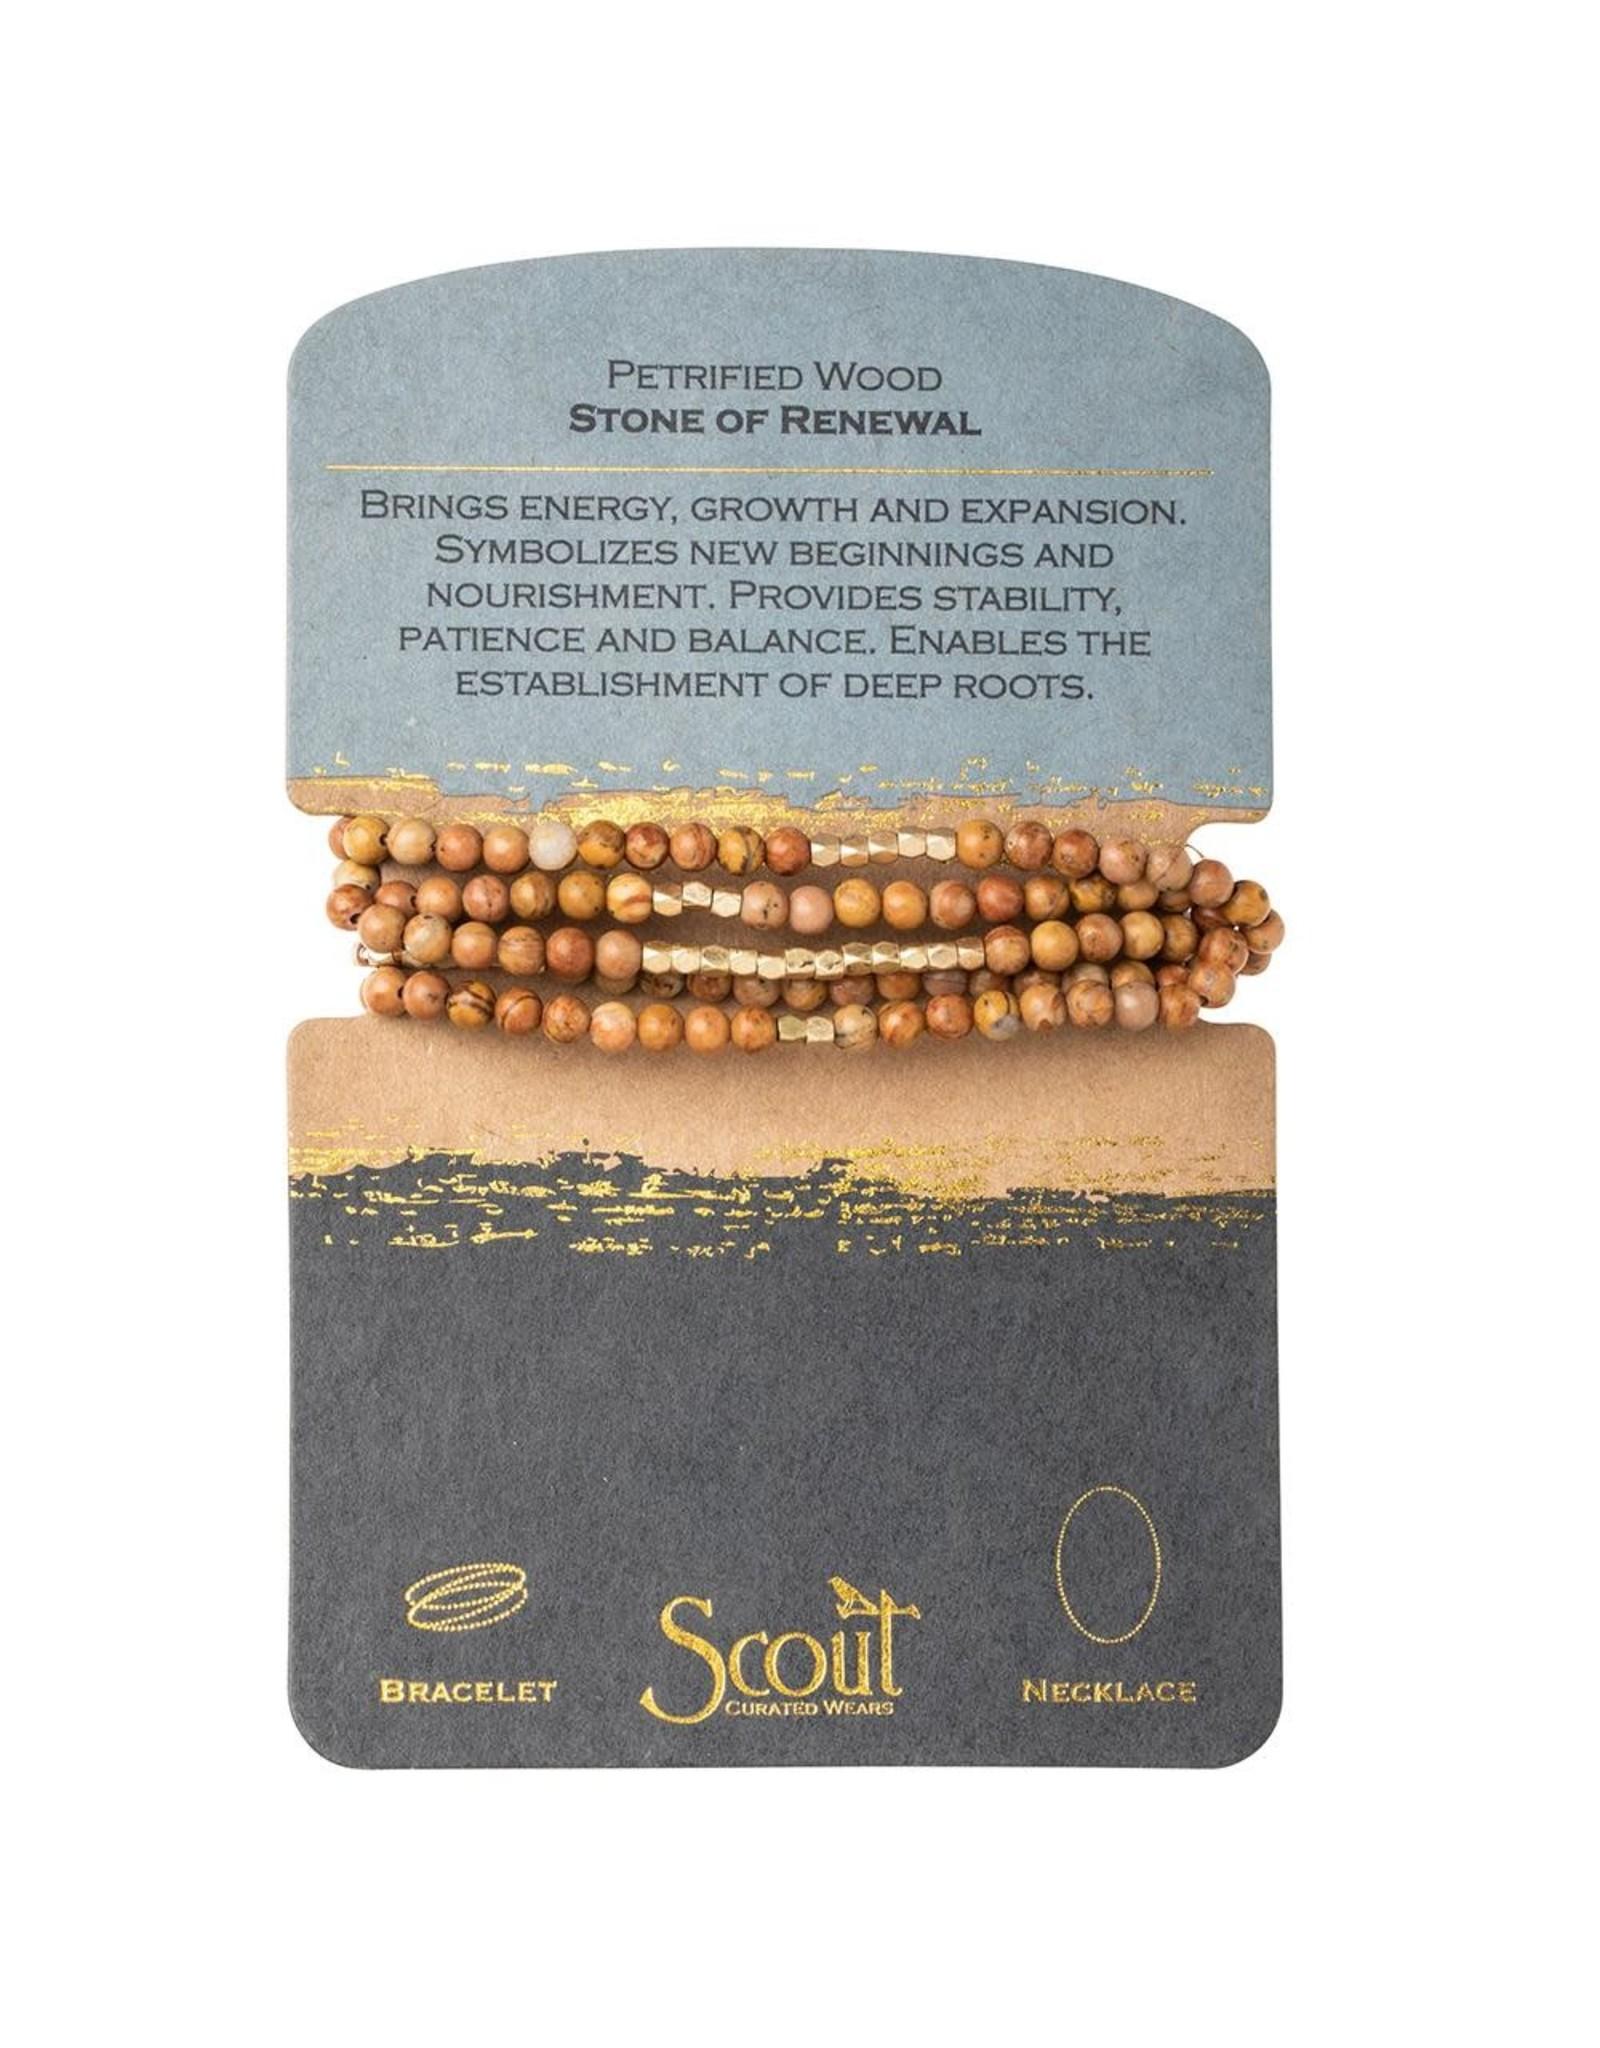 Scout SW033 Petrified Wood - Stone of Renewal